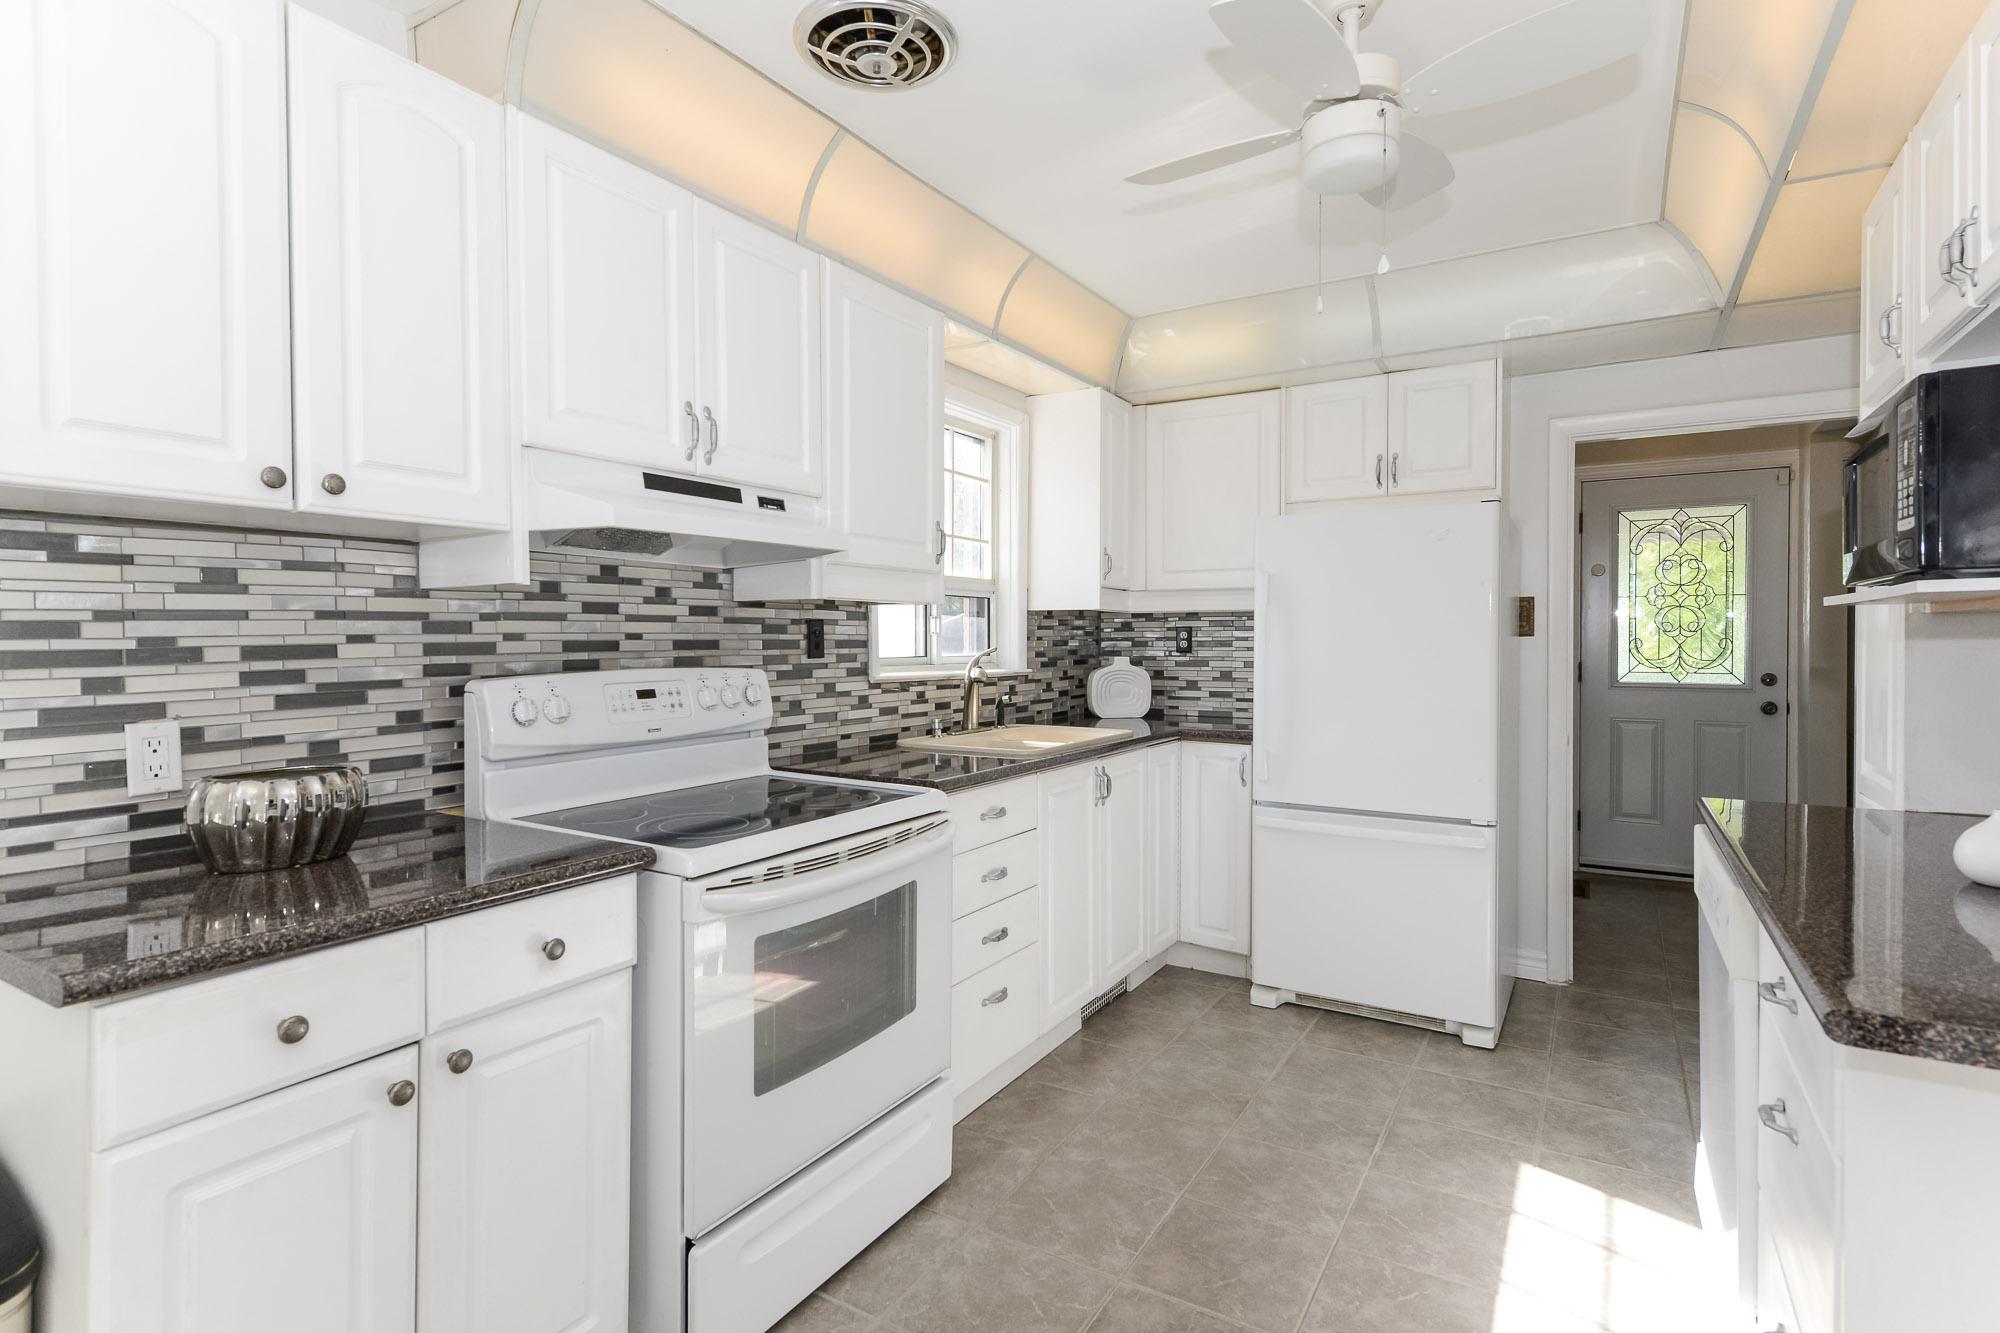 3 bedroom bungalow for sale 27 greylawn crescent for 10 morrison street toronto floor plans